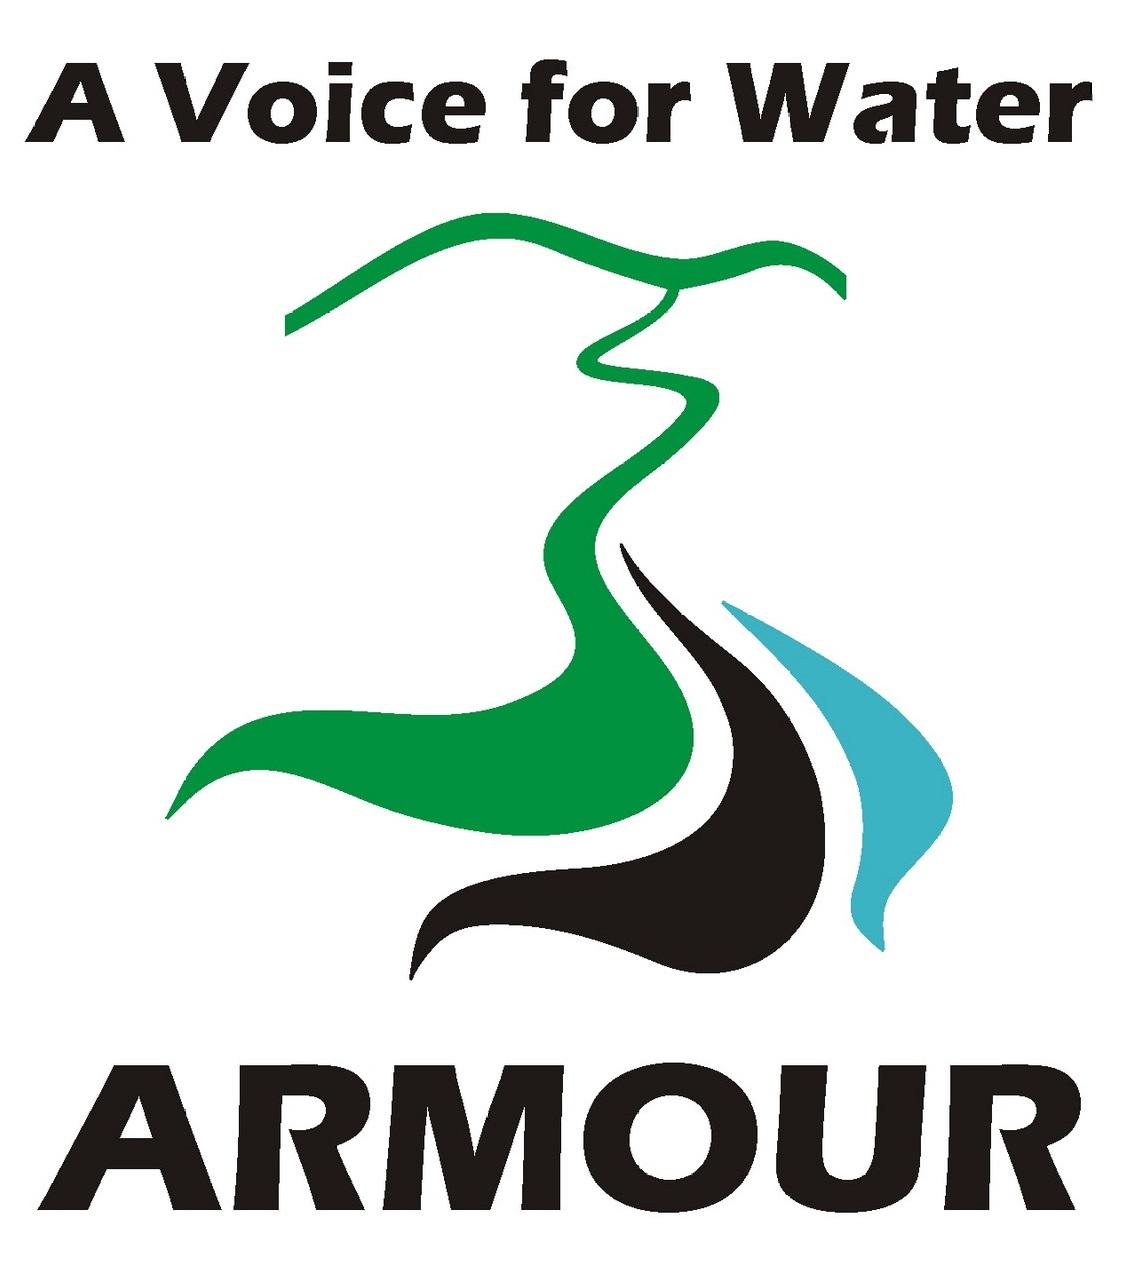 ARMOUR Logo & voice